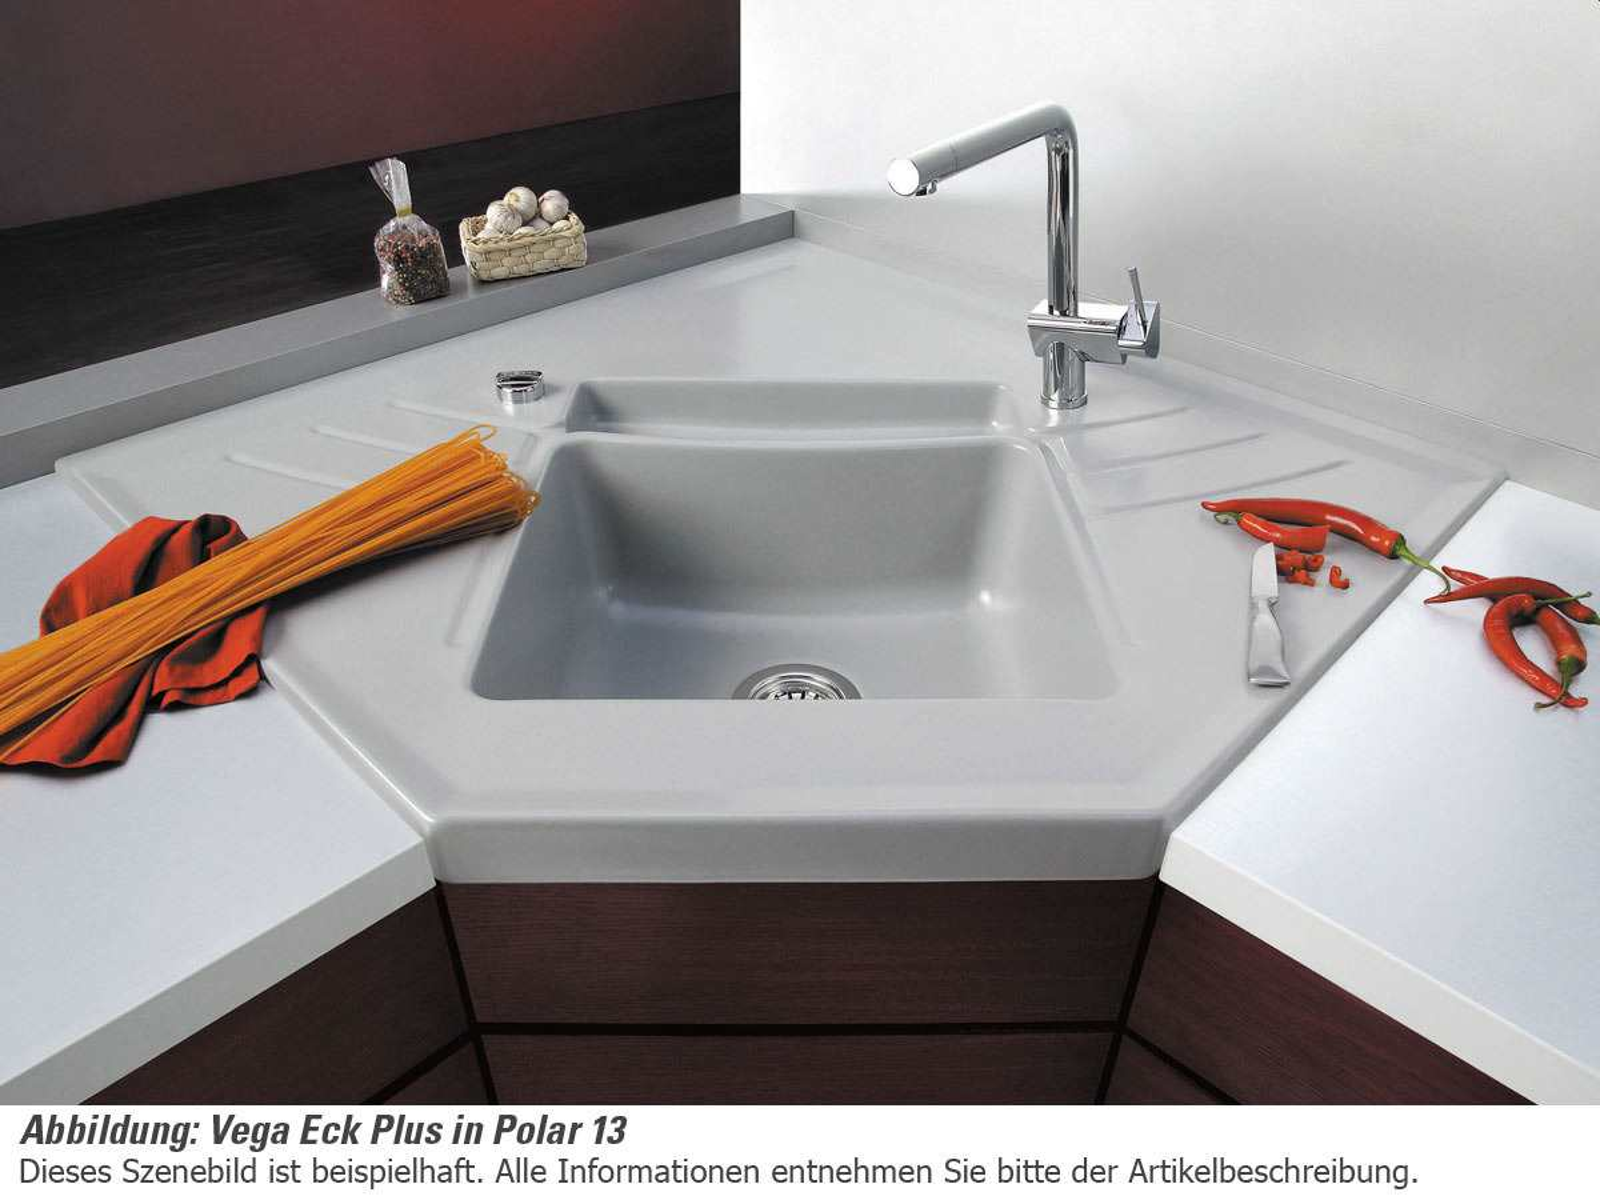 Outdoorküche Mit Spüle Ikea : Küche spüle modul ikea spüle küche